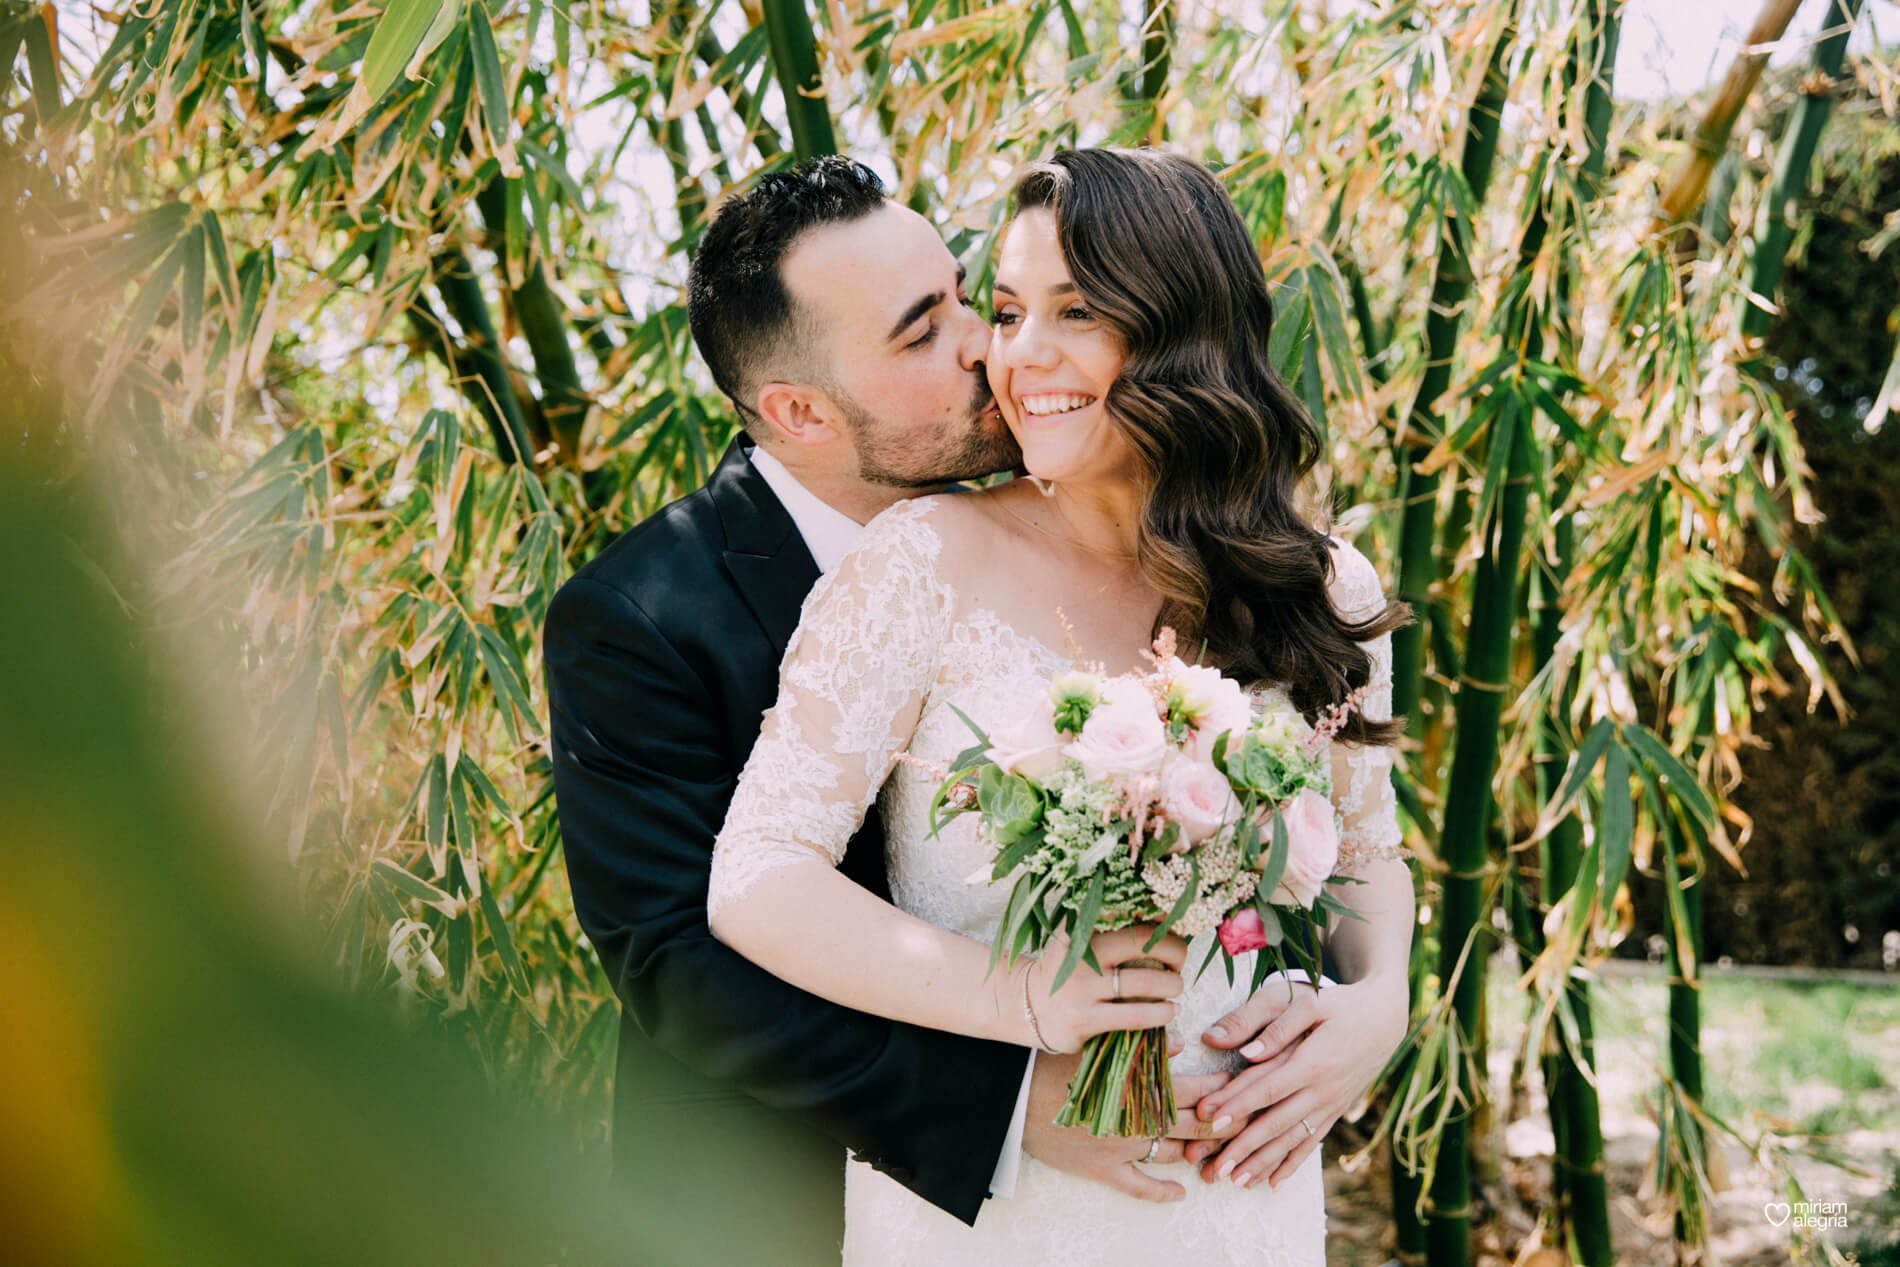 boda-en-finca-jurosa-miriam-alegria-84